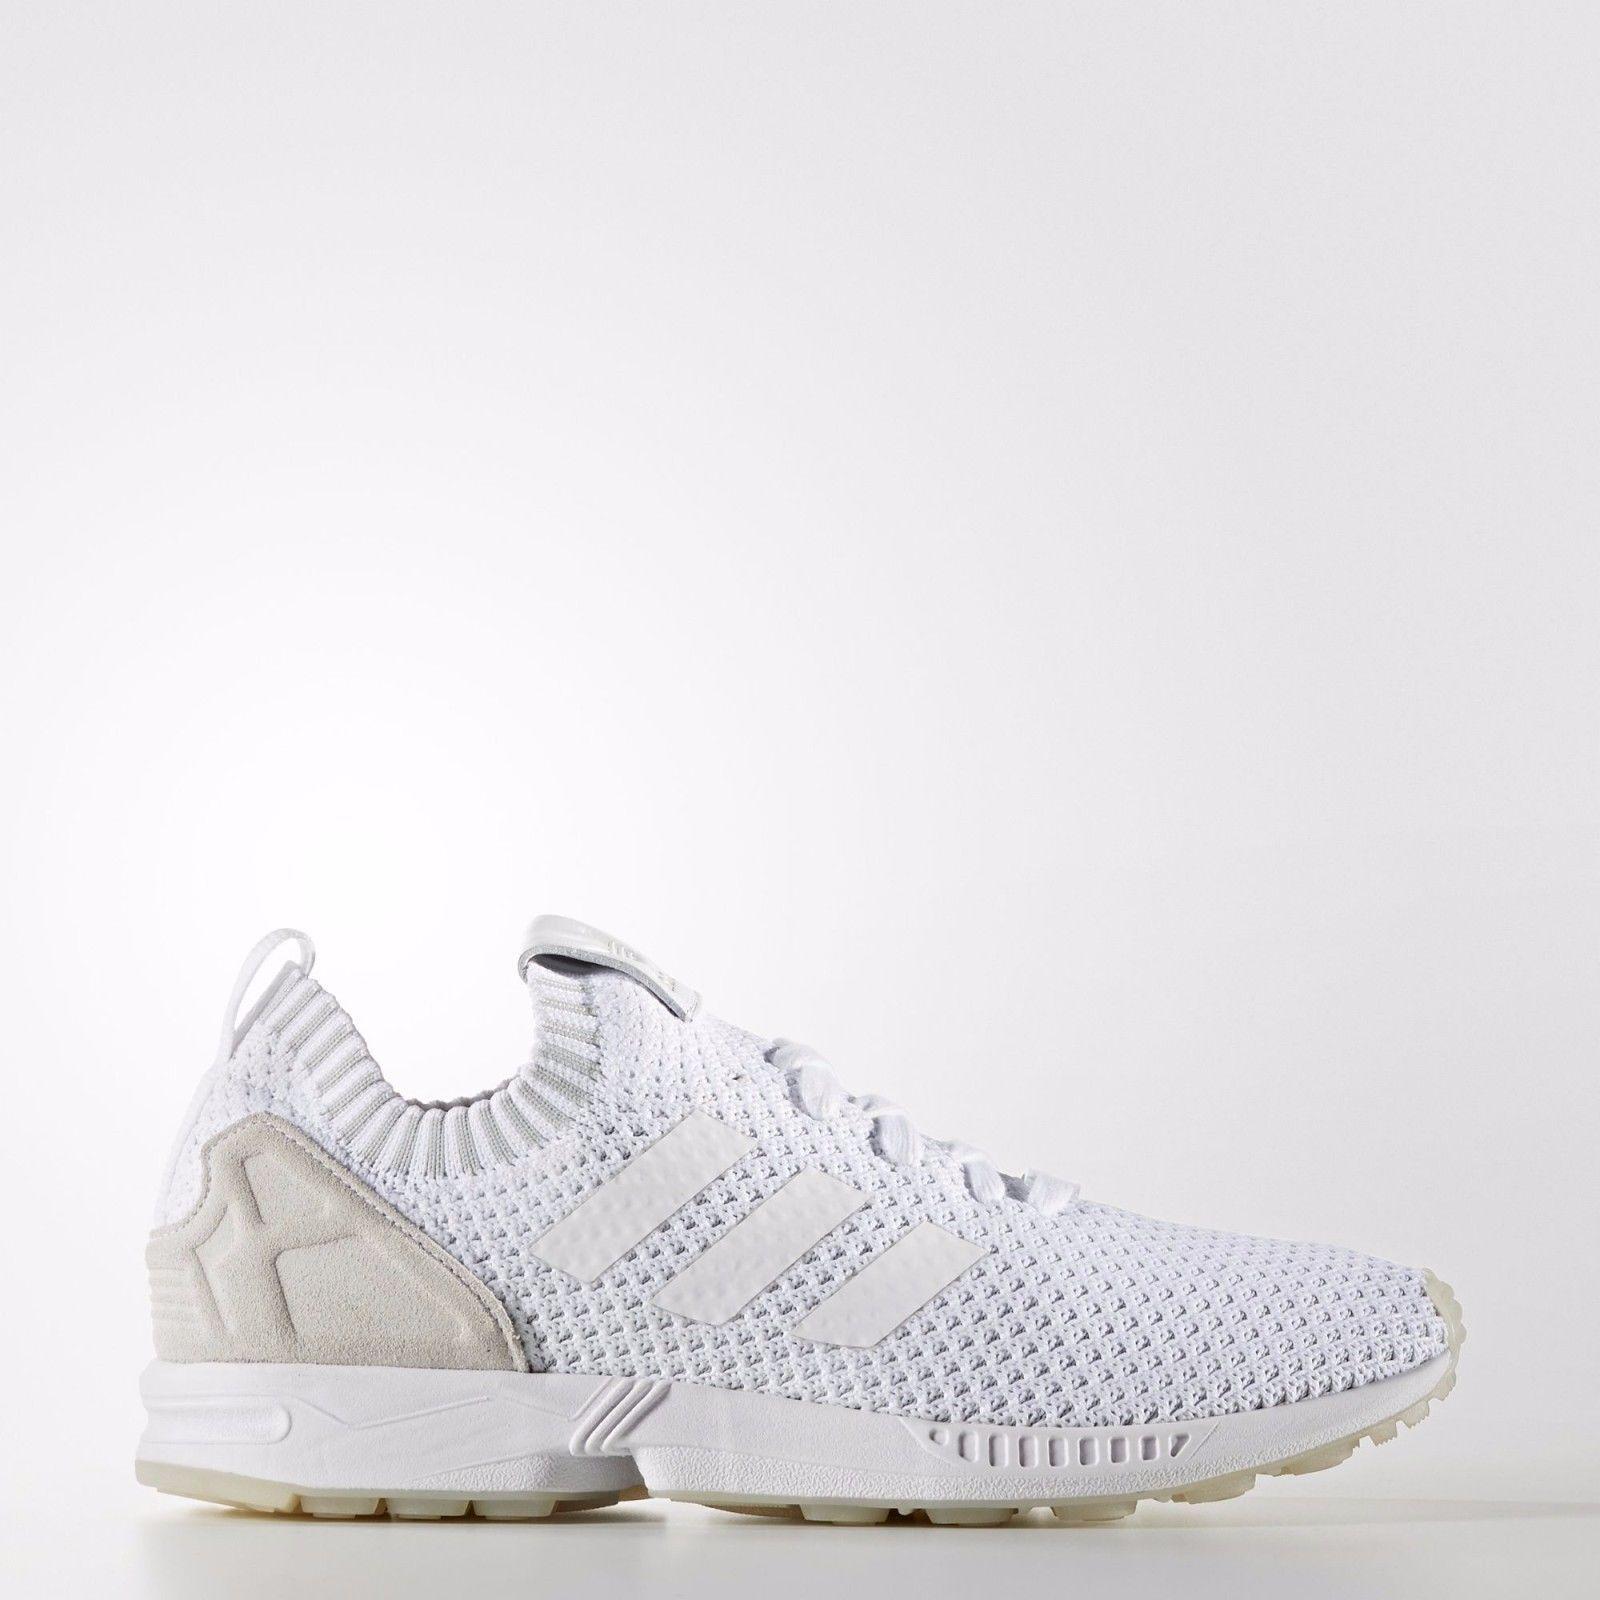 Adidas originali zx flusso pk primeknit triplo bianco casual sz 11,5 s75977 scarpe casual bianco ac3fd0